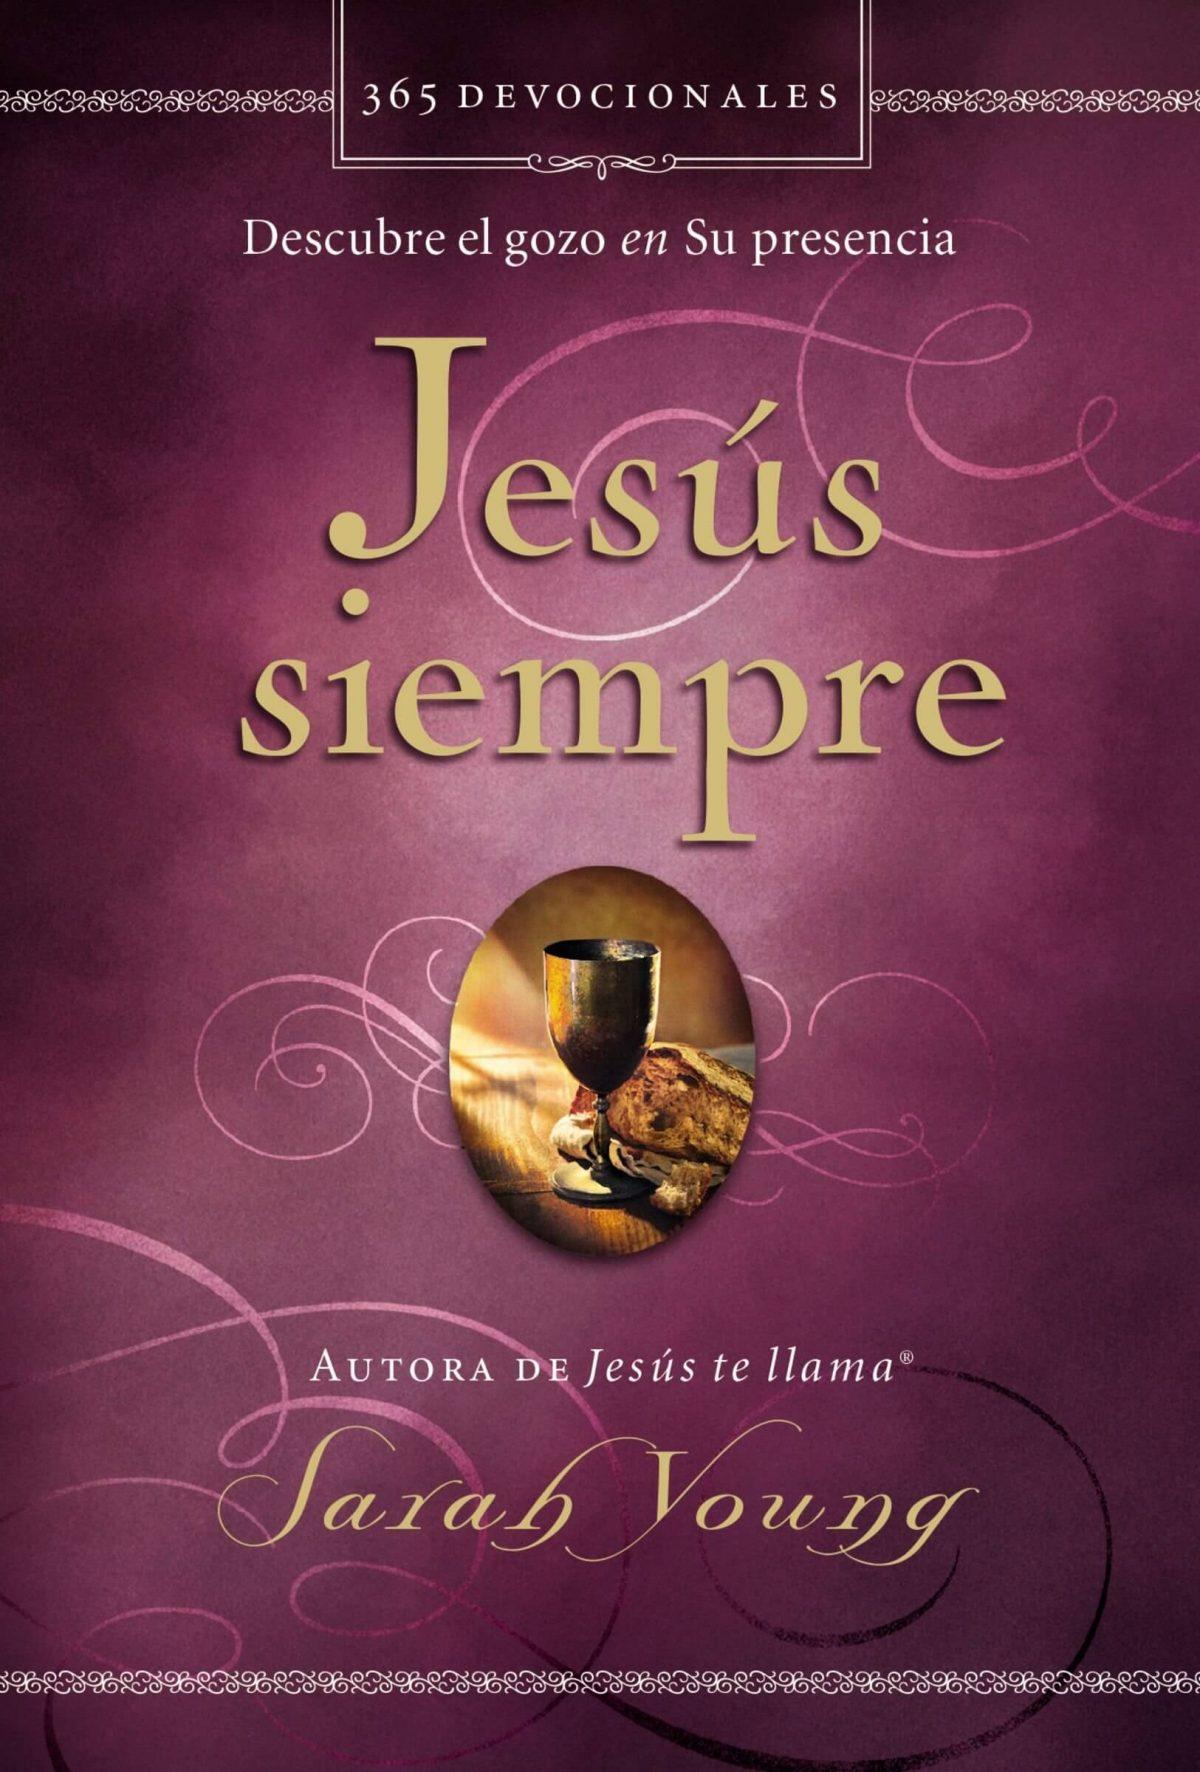 JESUS SIEMPRE